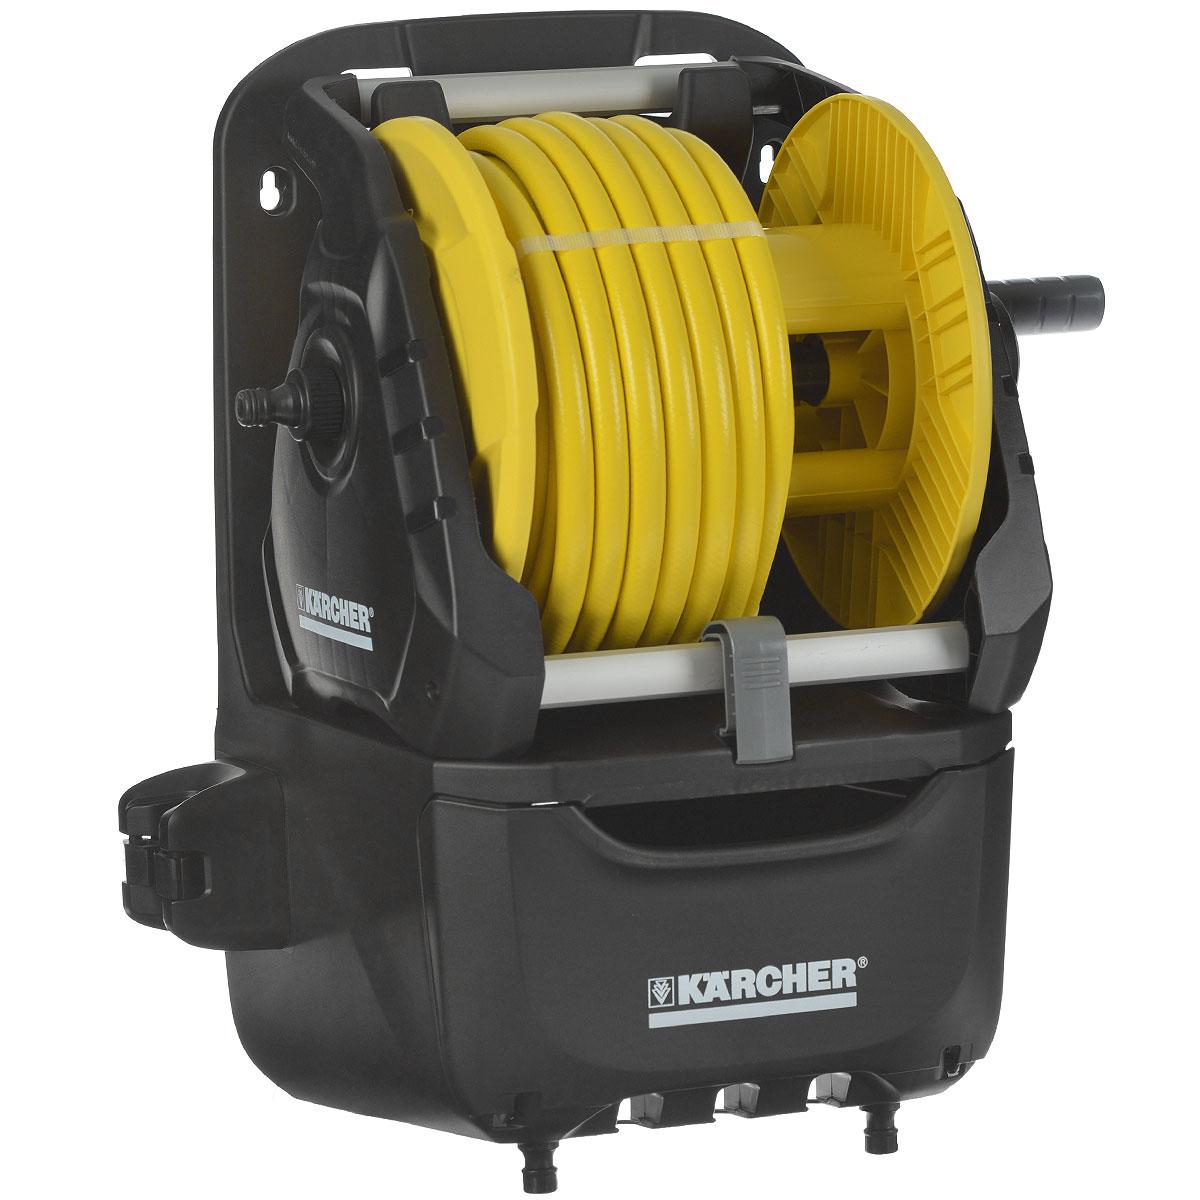 Катушка Karcher HR 7.315 Kit, со шлангом, 15 м 2.645-164.0 karcher в москве дешево